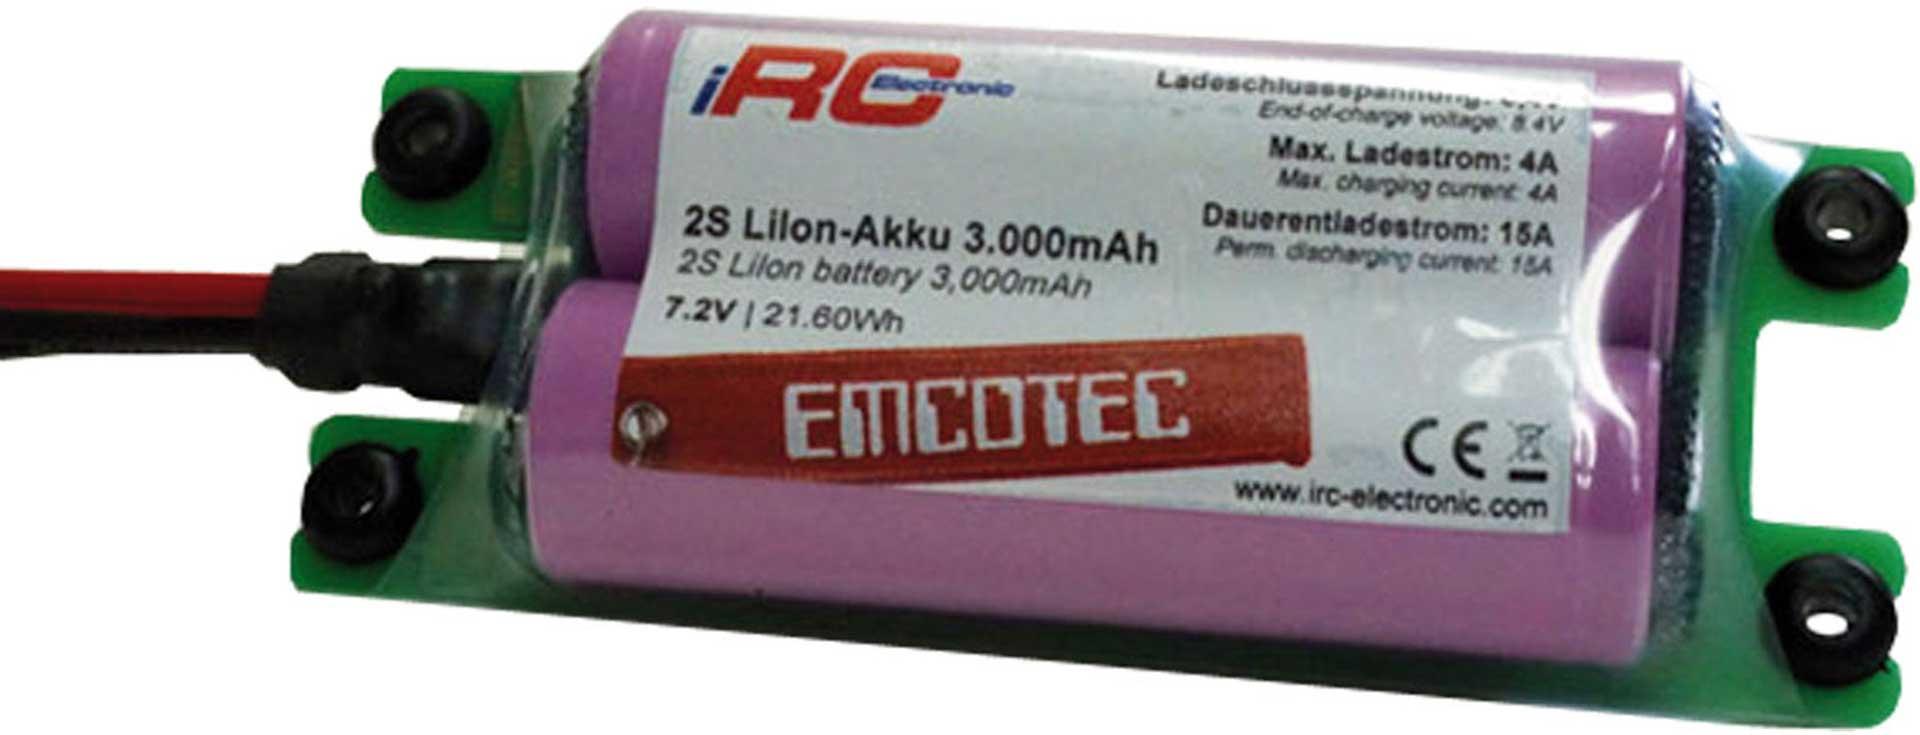 EMCOTEC LION AKKU 3000 MAH 2S 7,2V COMPACT 15A